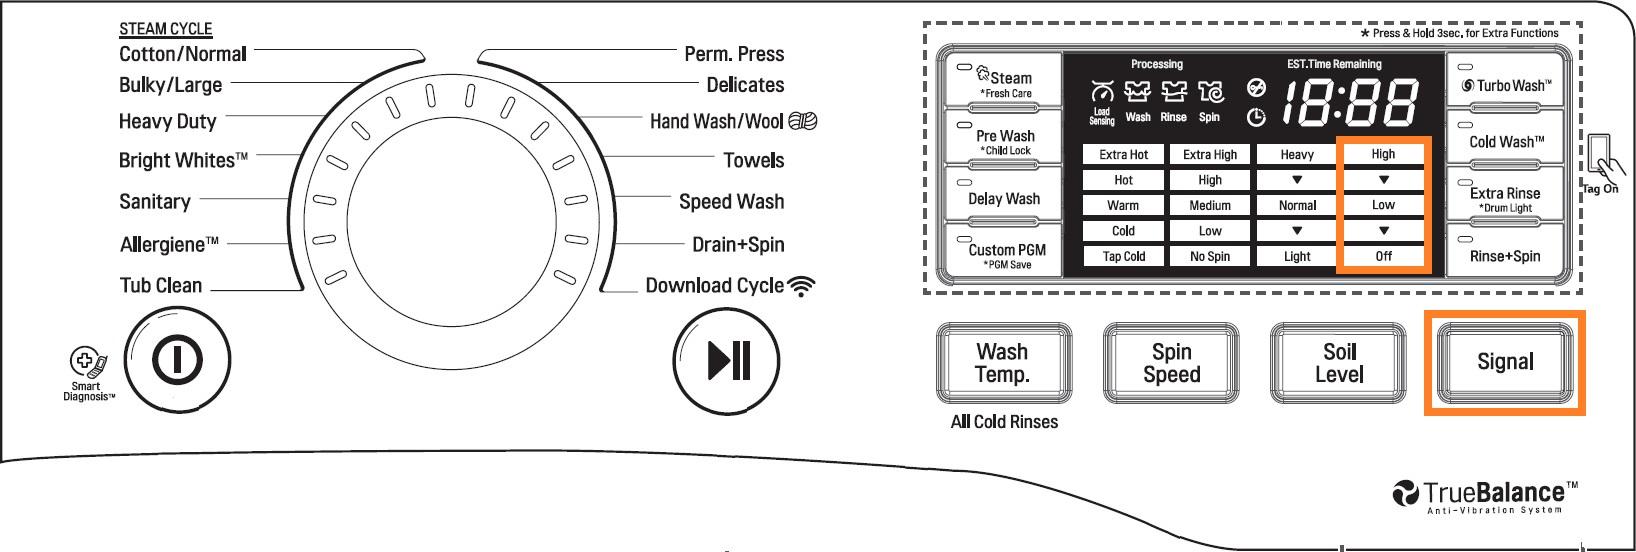 LG Help Library: Adjusting sound notification volume | LG Canada